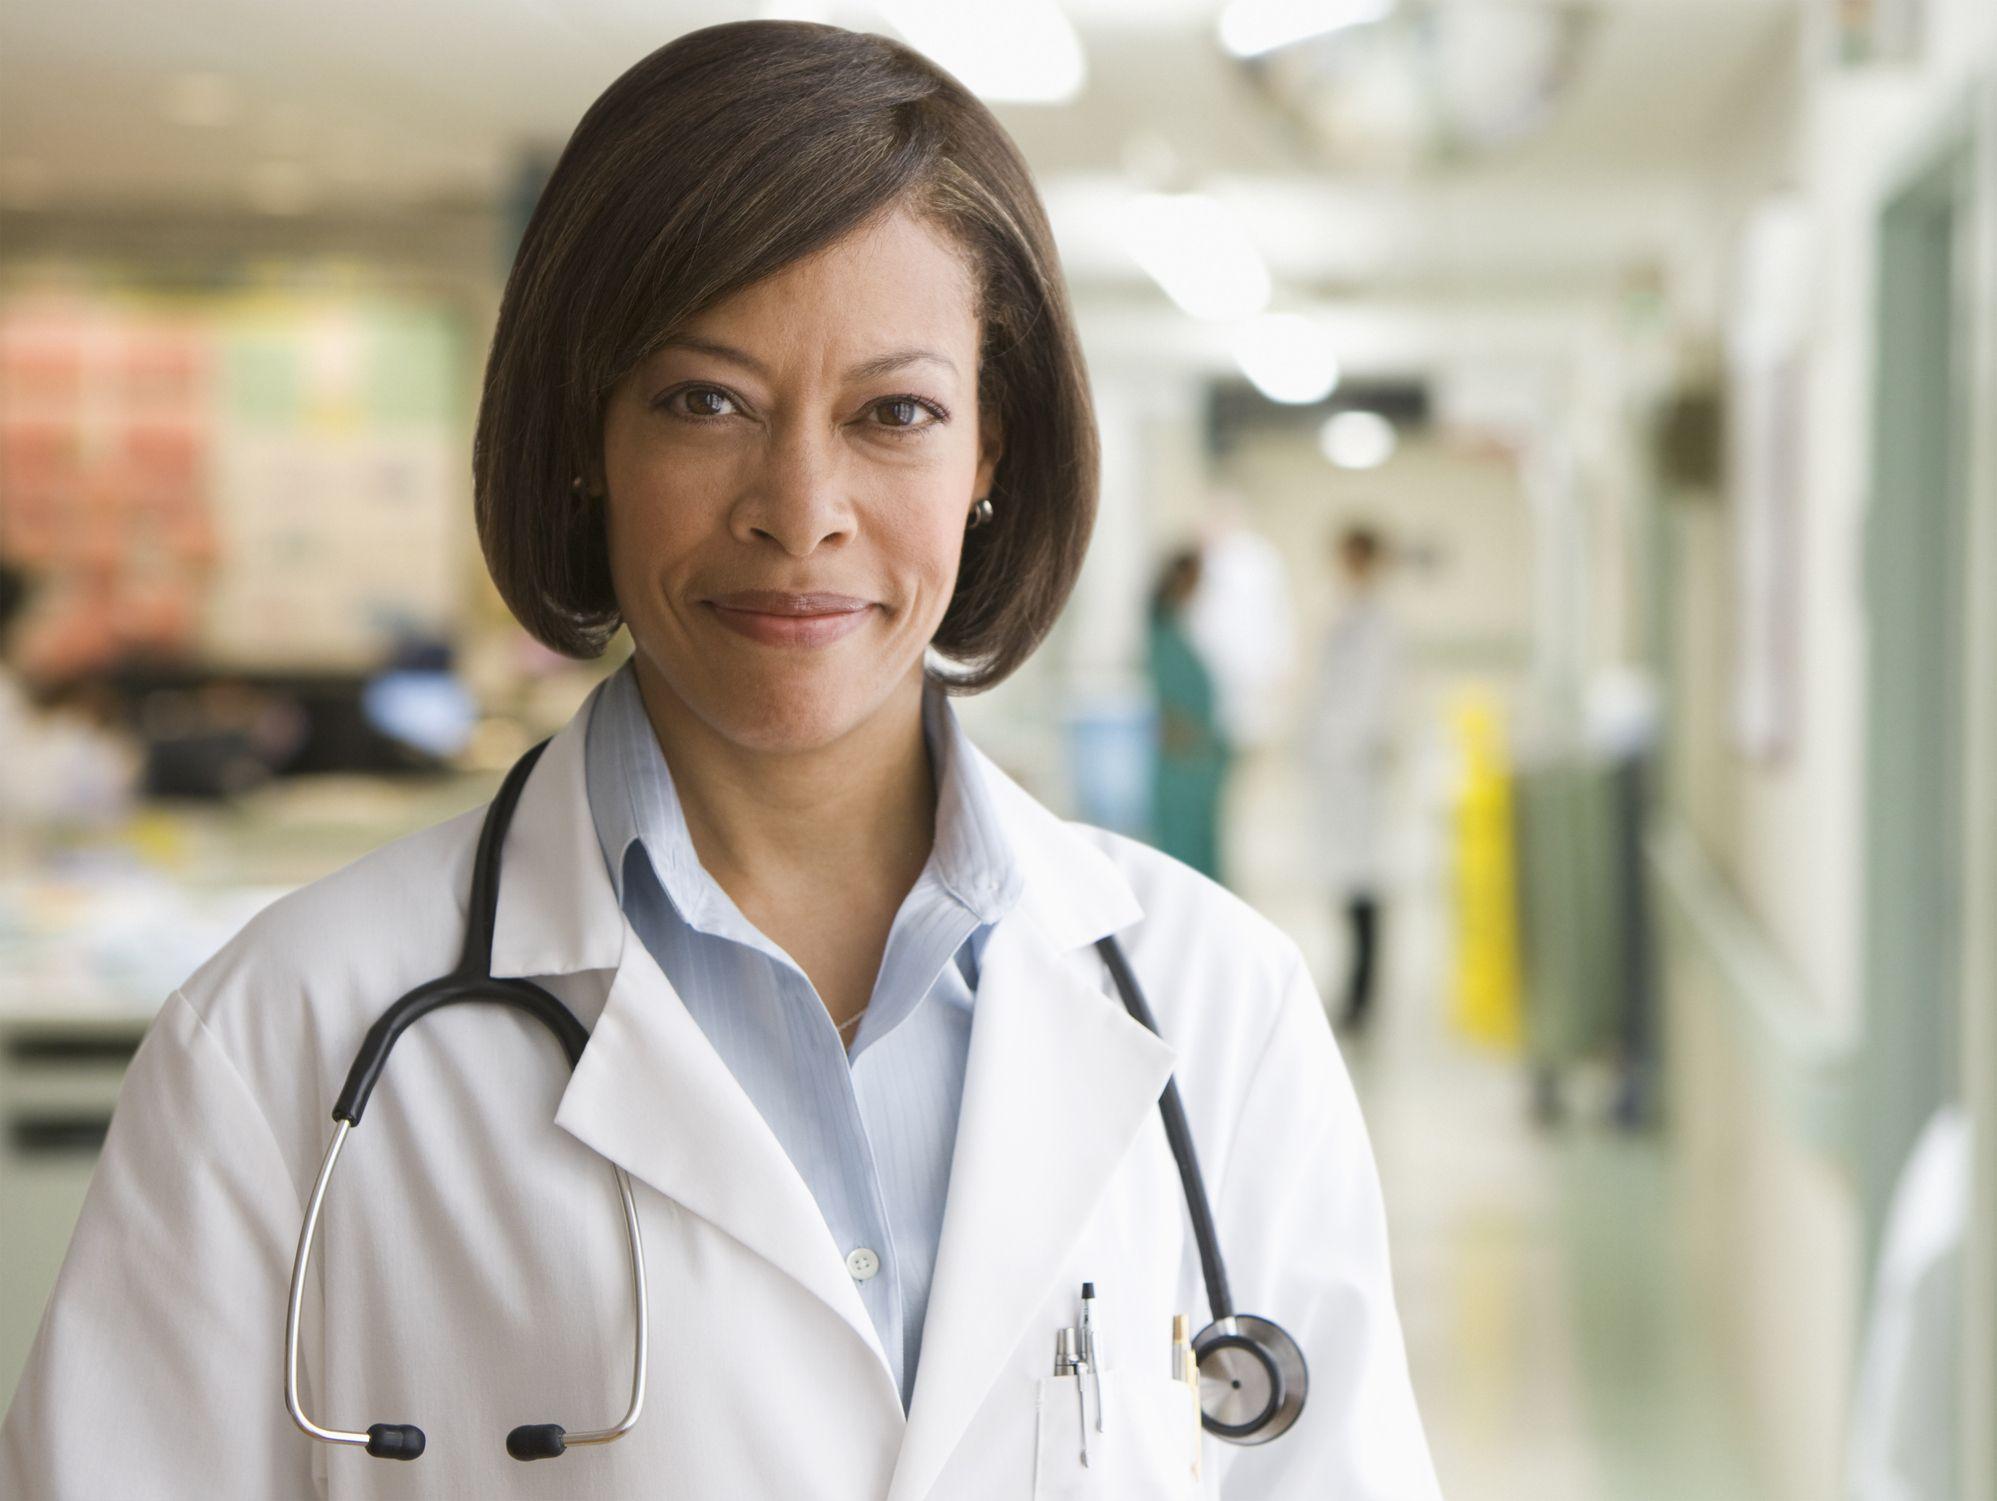 health professions high school ranking